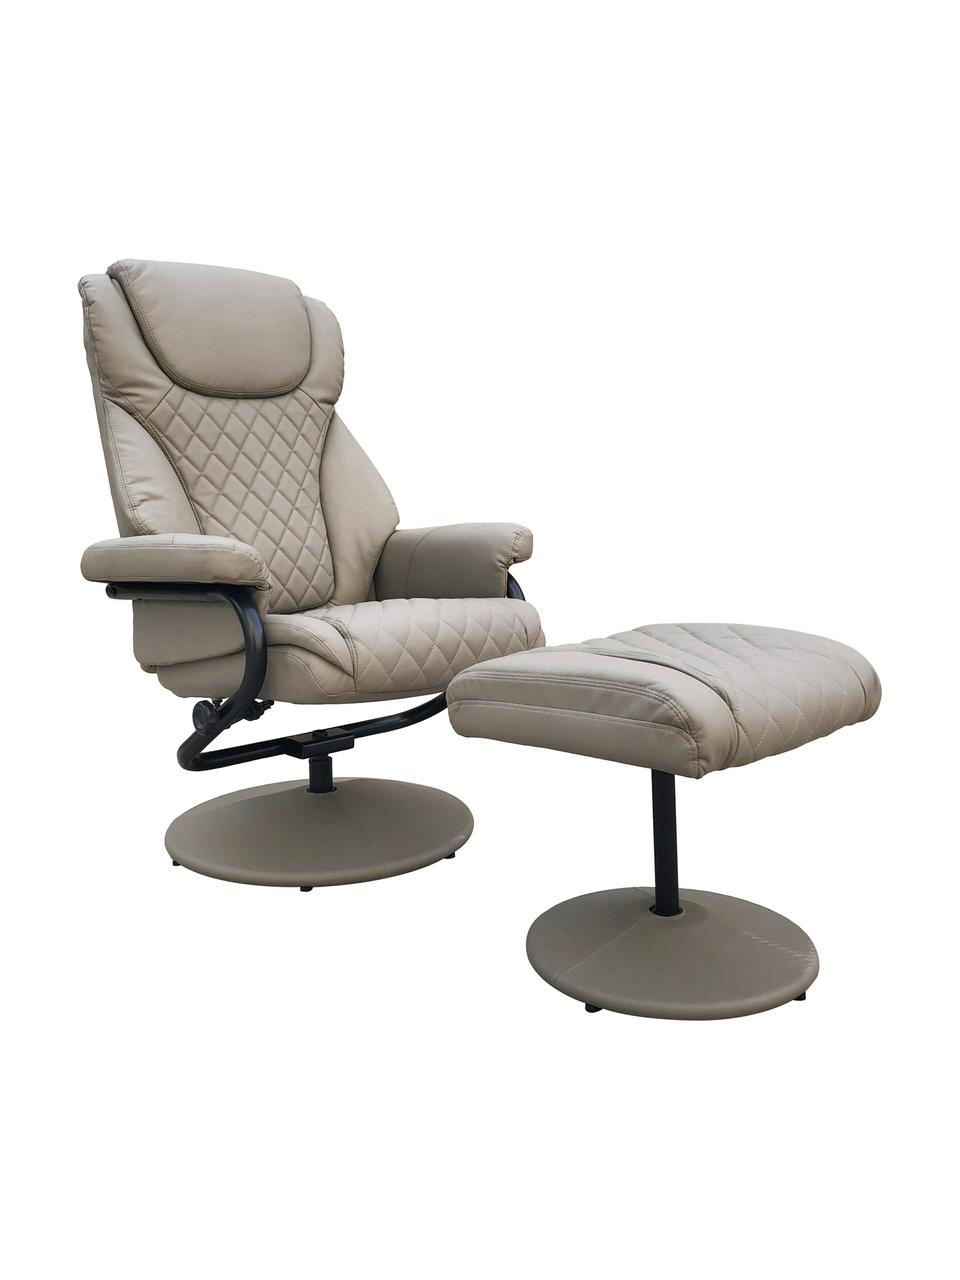 Sillón reclinable con reposapiés Relax, Tapizado: piel sintética, Gris, An 80 x Al 112 cm